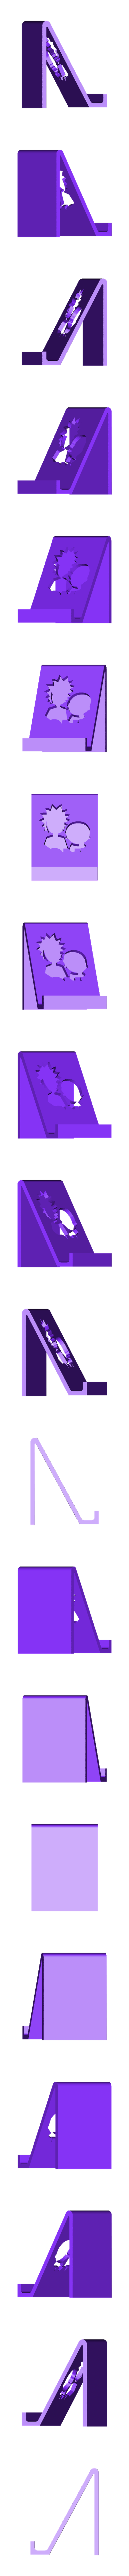 Rick and Morty-02.STL Download STL file RICK E MORTY SUPORTE TELEFONE • 3D printer model, BrunoLopes